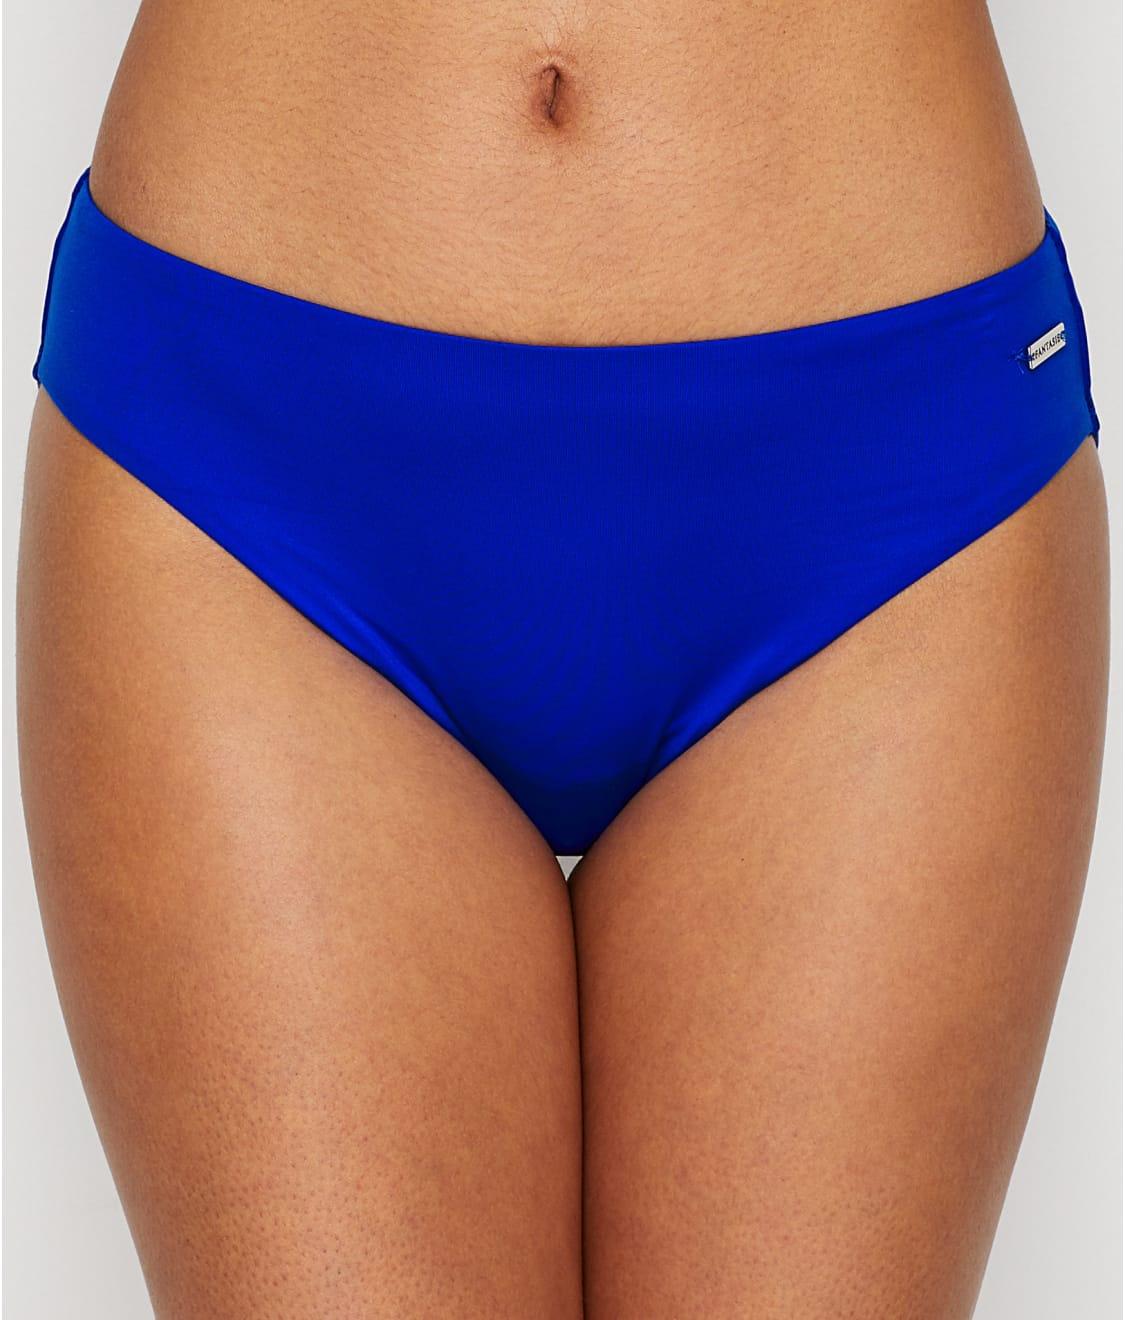 d8f78f12b941 Fantasie Ottawa Mid Rise Bikini Bottom